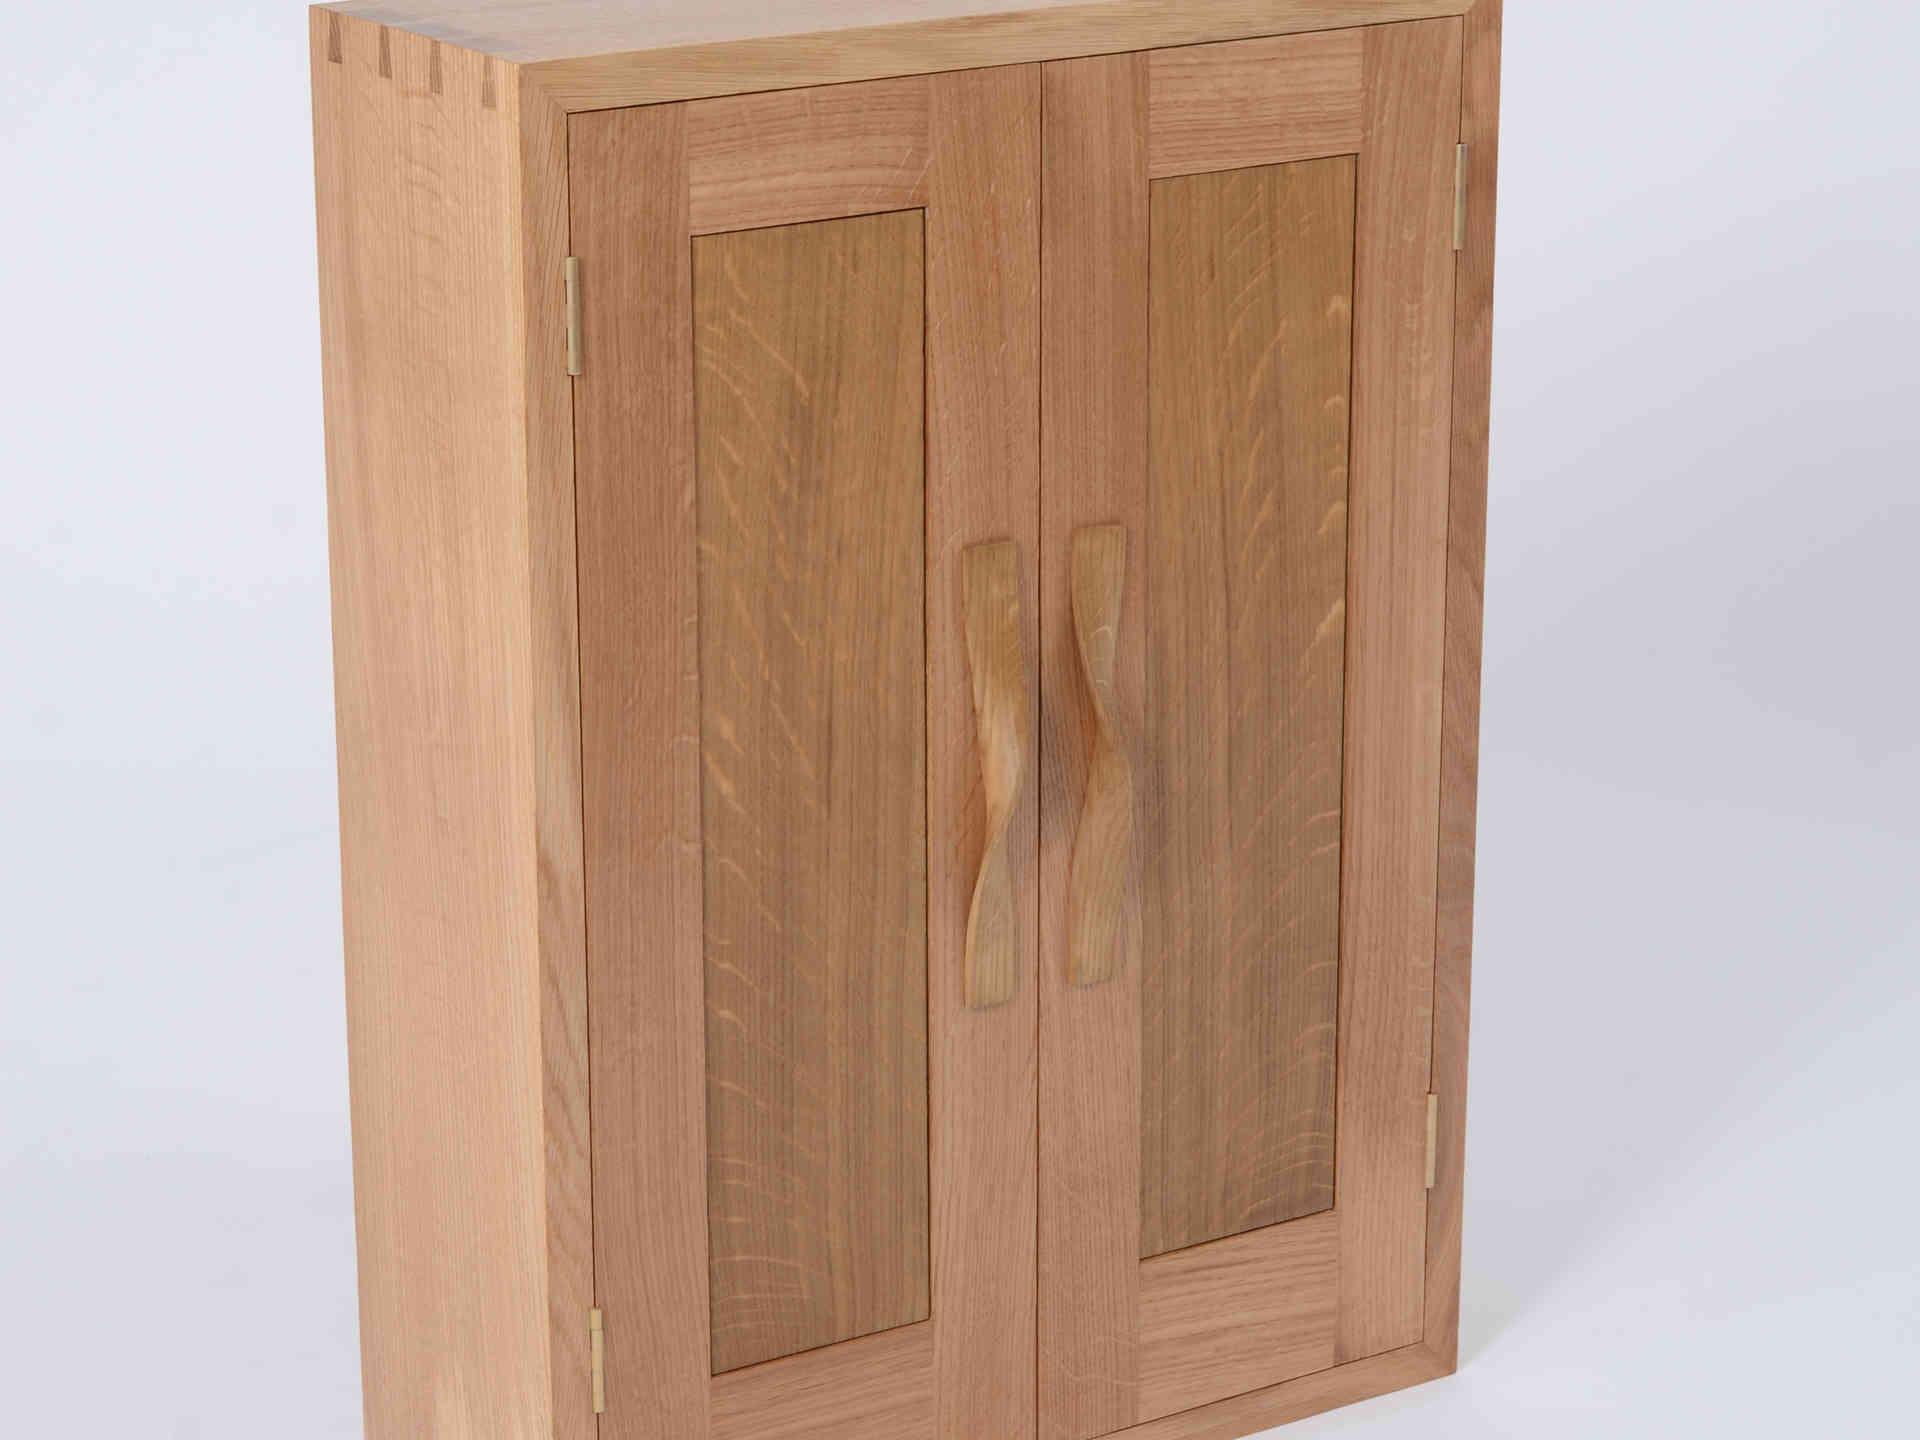 Small Oak Wall Cabinet